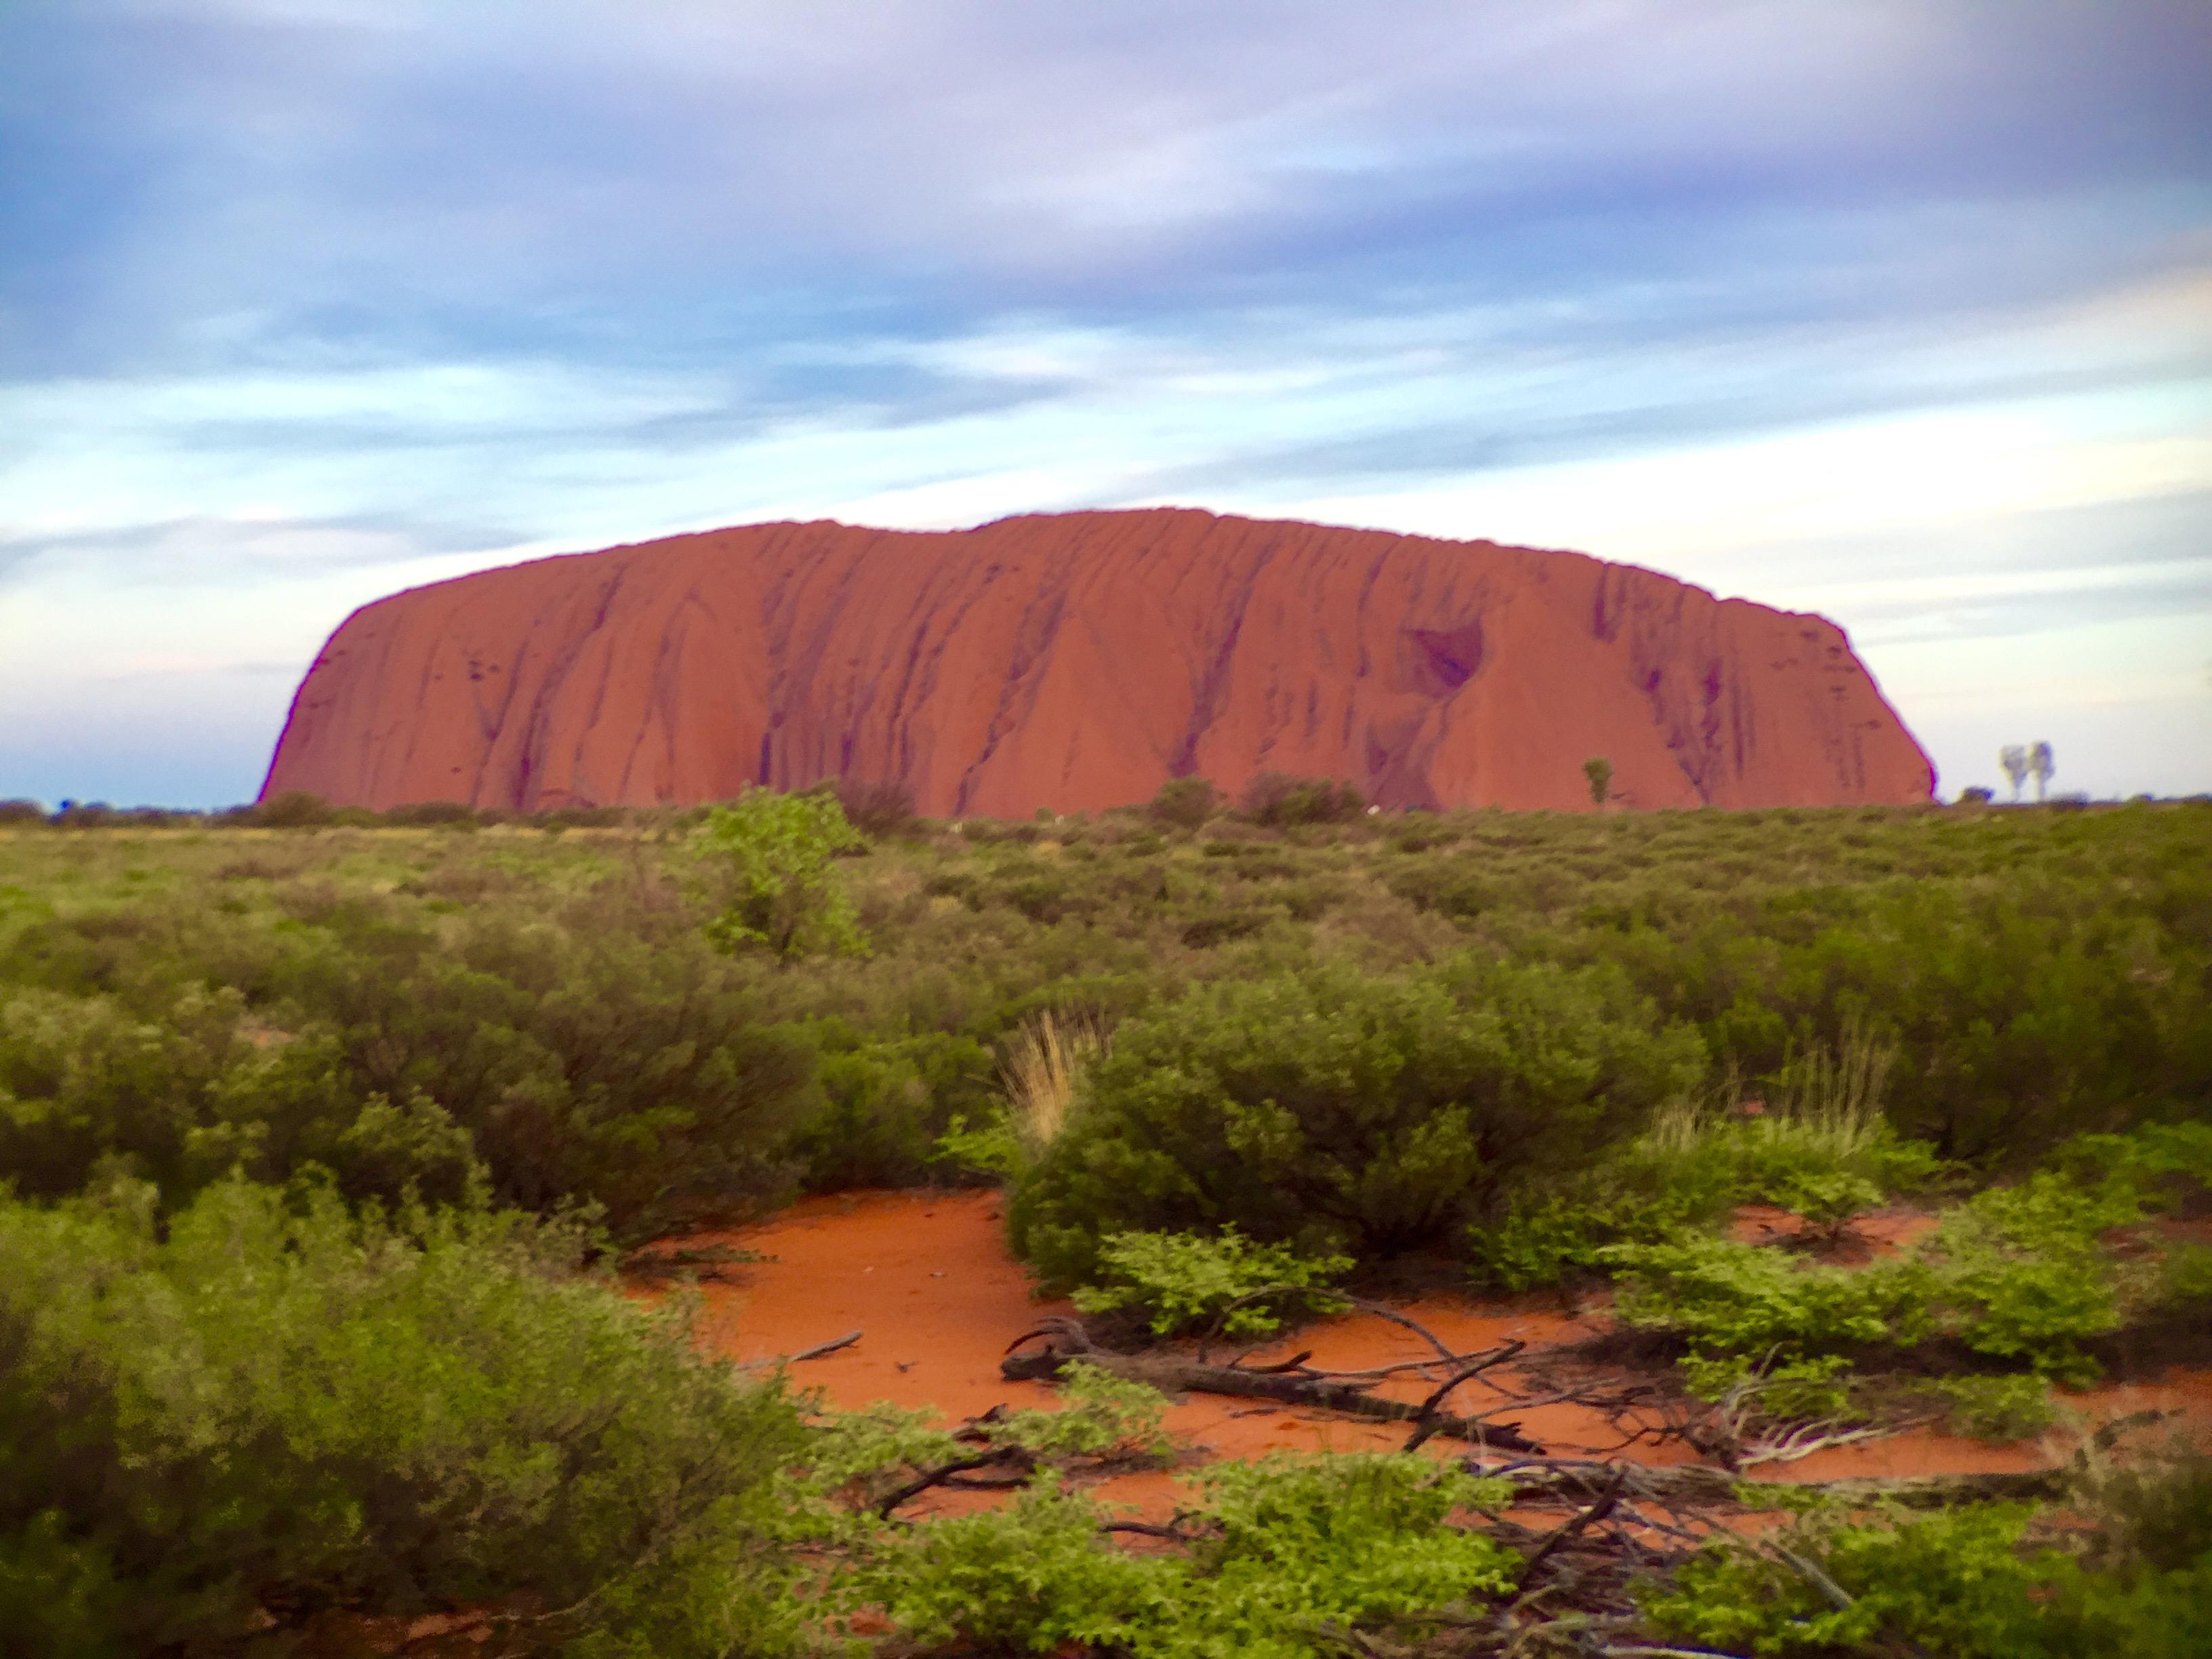 Uluru-Kata Tjuta National Park, Australia  № 891614 загрузить